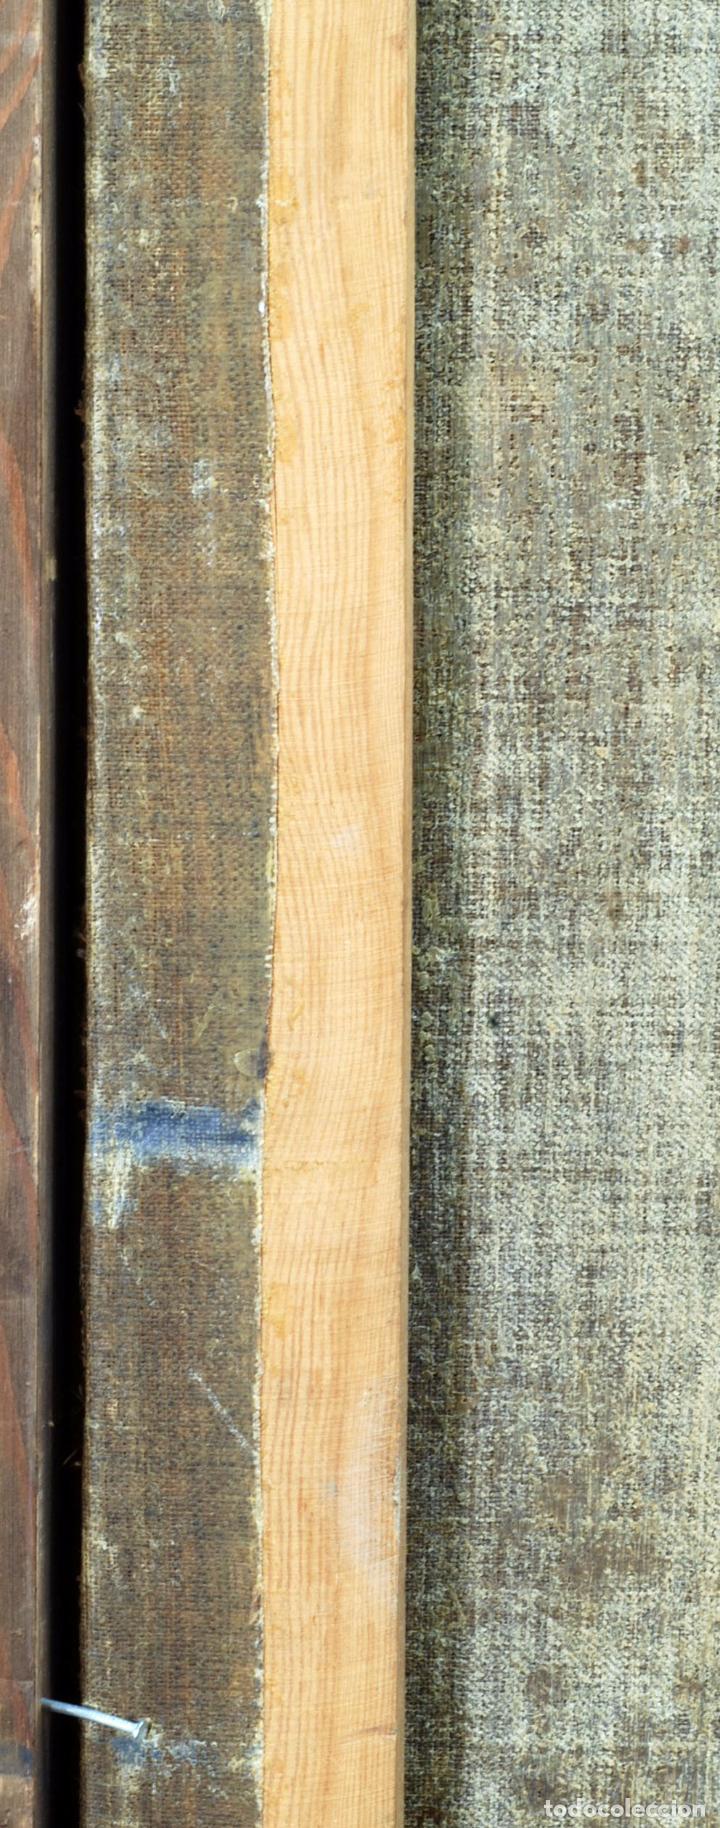 Arte: Niño de la espina óleo sobre lienzo escuela andaluza siglo XVII - Foto 11 - 89271488